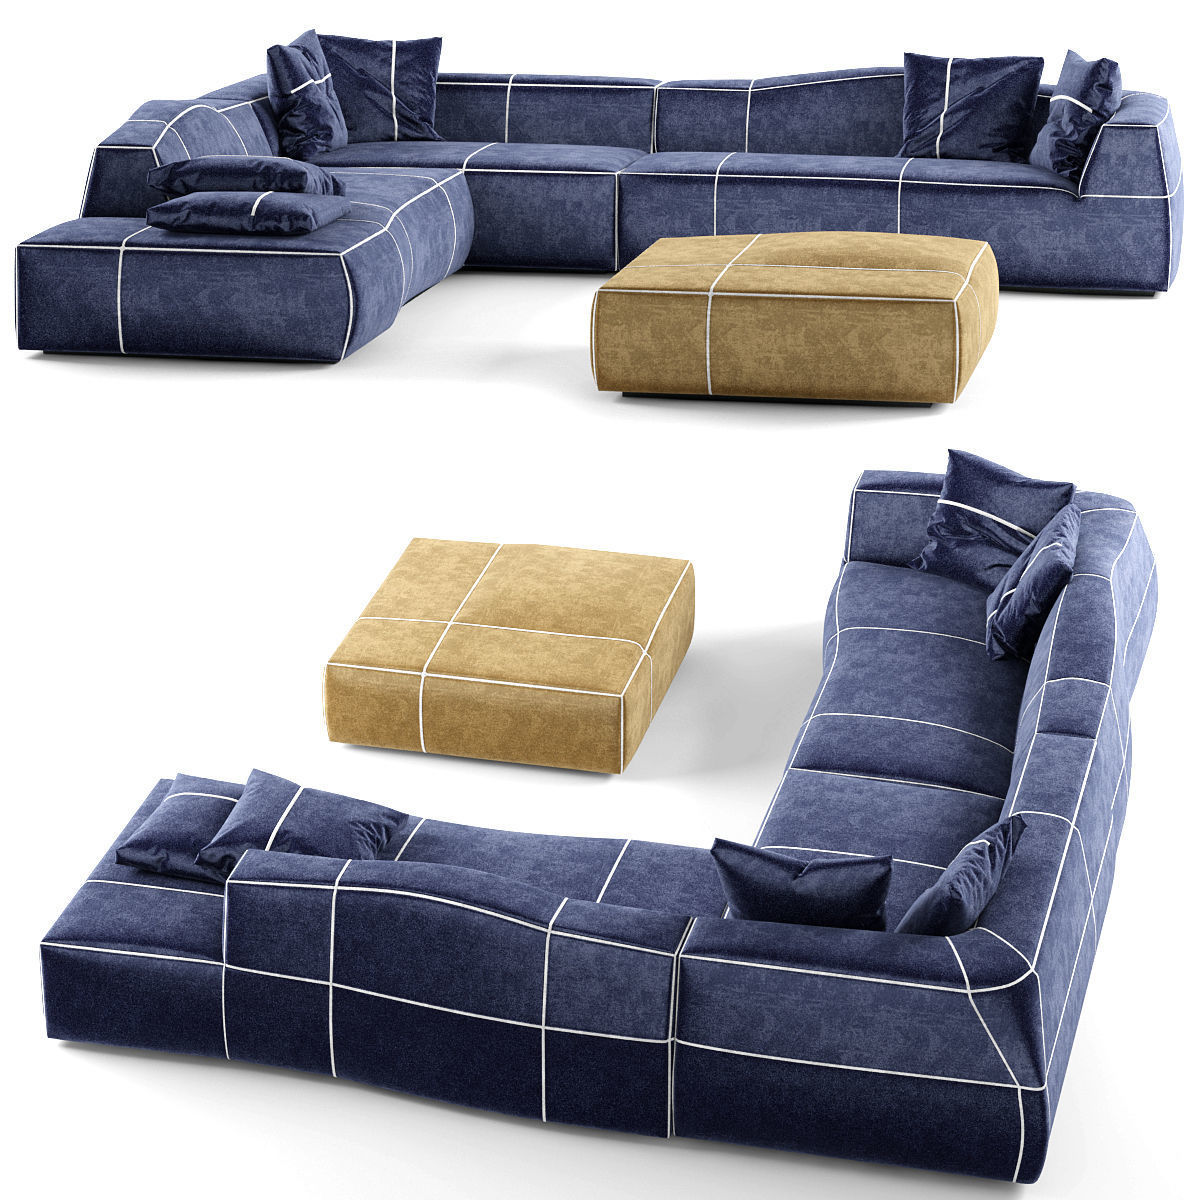 Combination leisure sofa